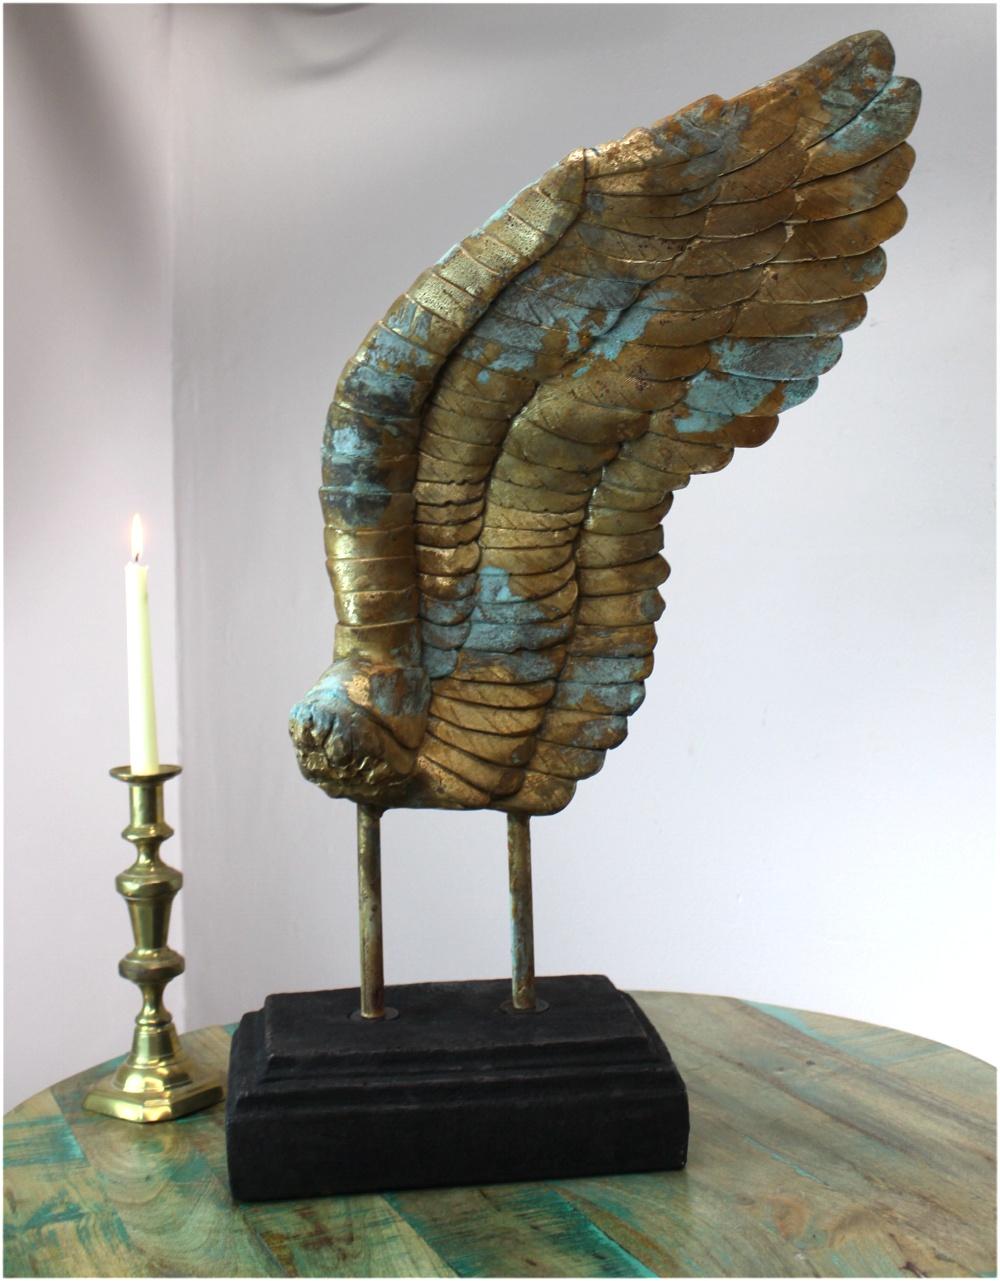 Eagle Angel Cherub Big Gold Leaf Wing Sculpture Art Hand Made